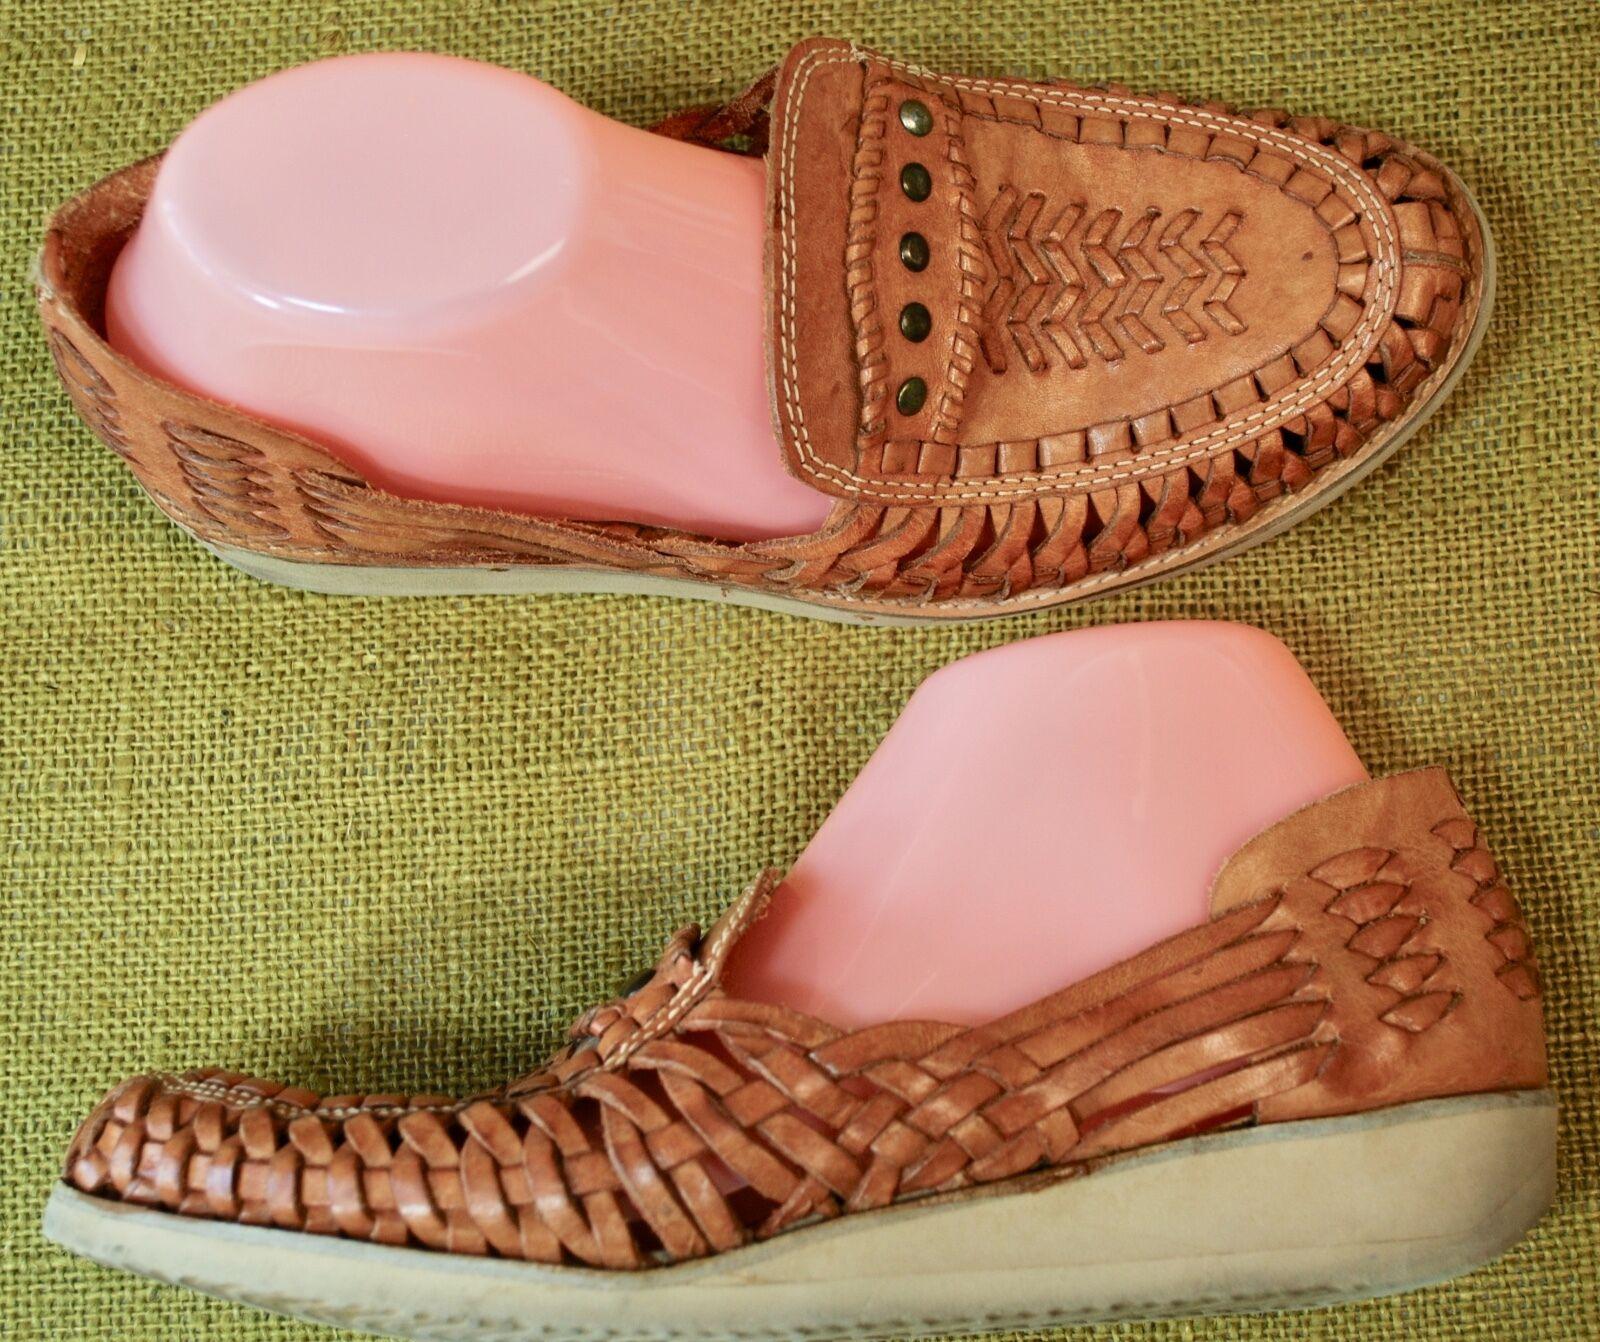 Deer Stags   Glen scarpe Co Slip On Loafers Braided Leather scarpe Uomo 7 D